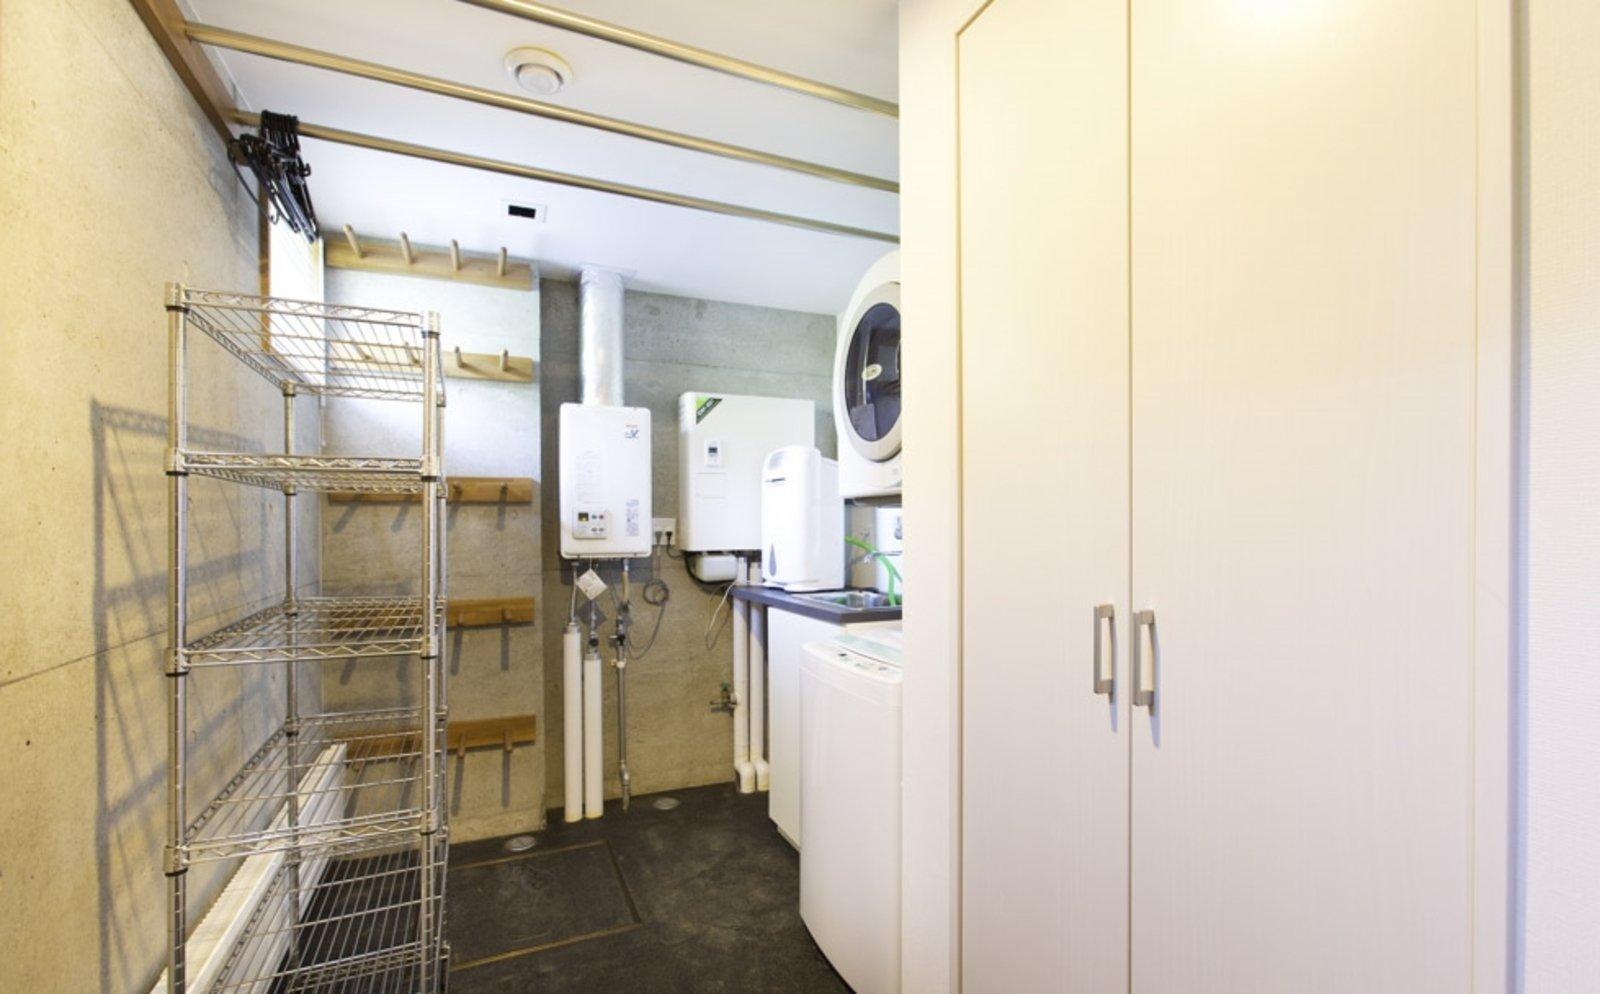 Kon m 3bdr house drying room large